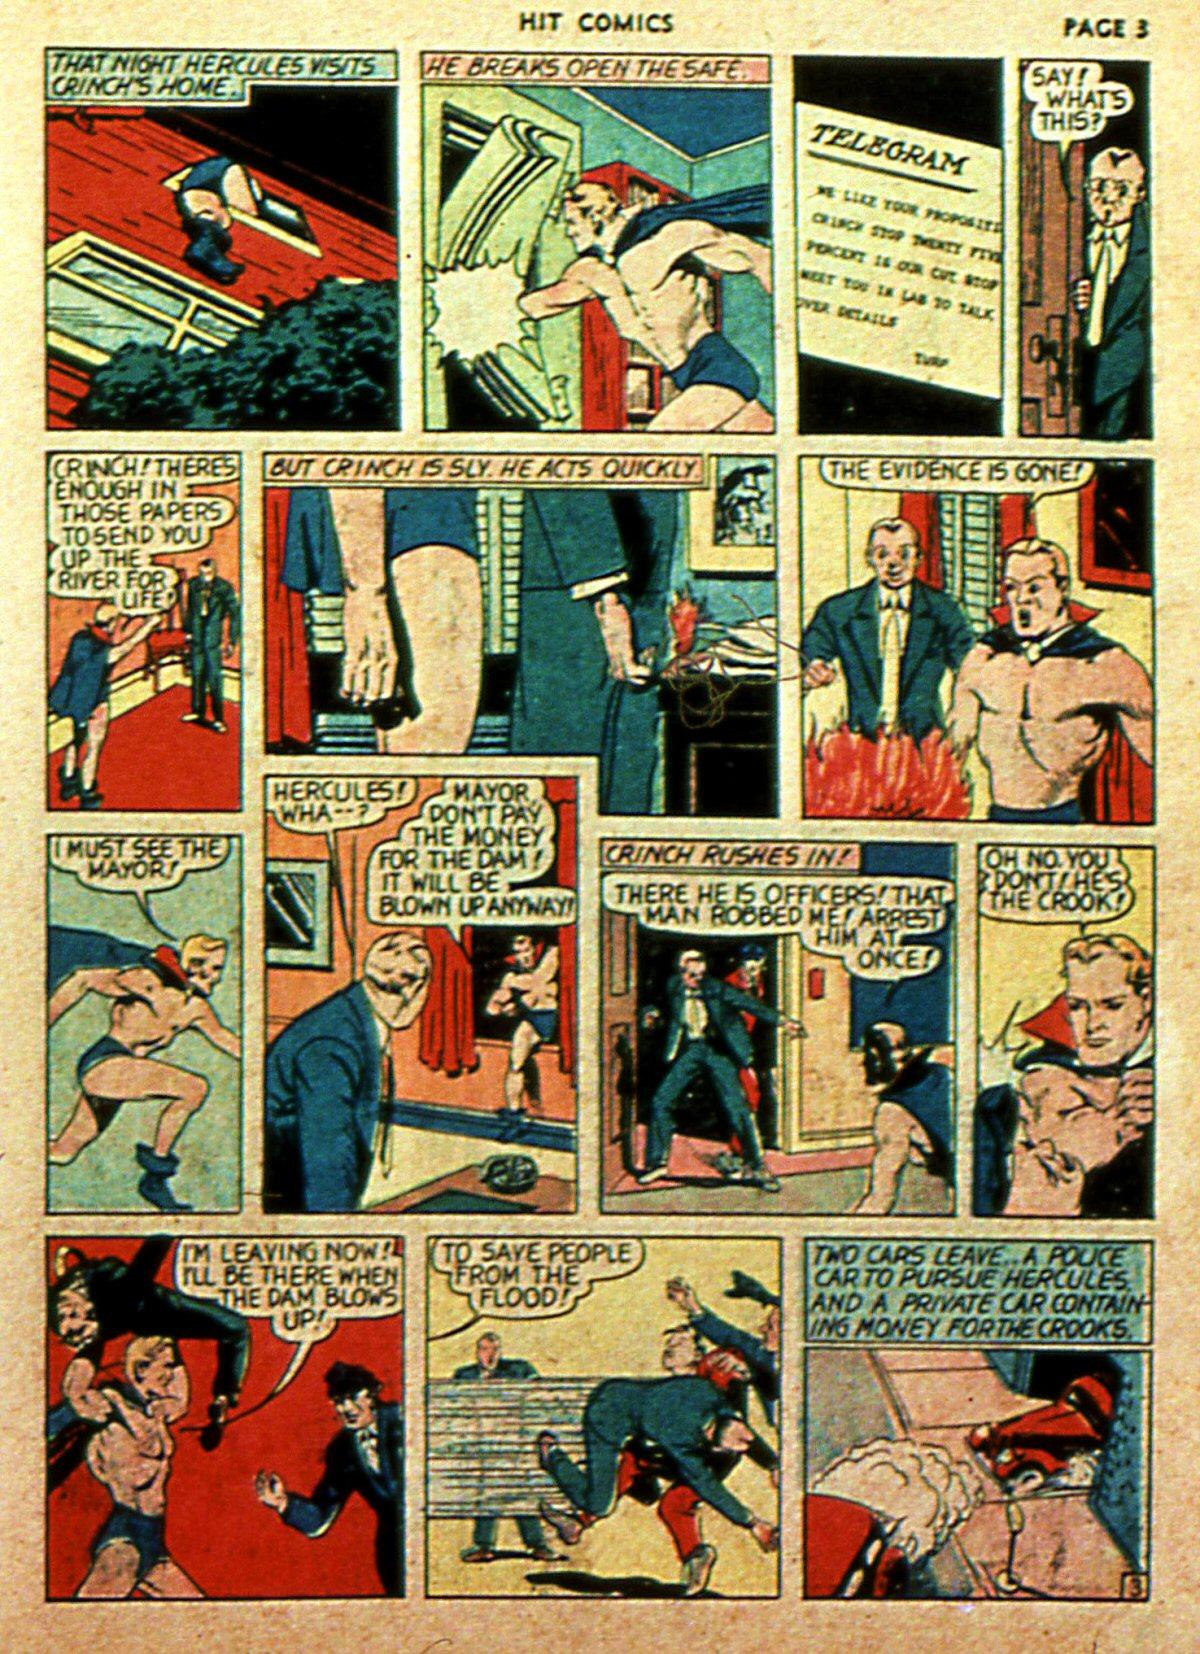 Read online Hit Comics comic -  Issue #2 - 5